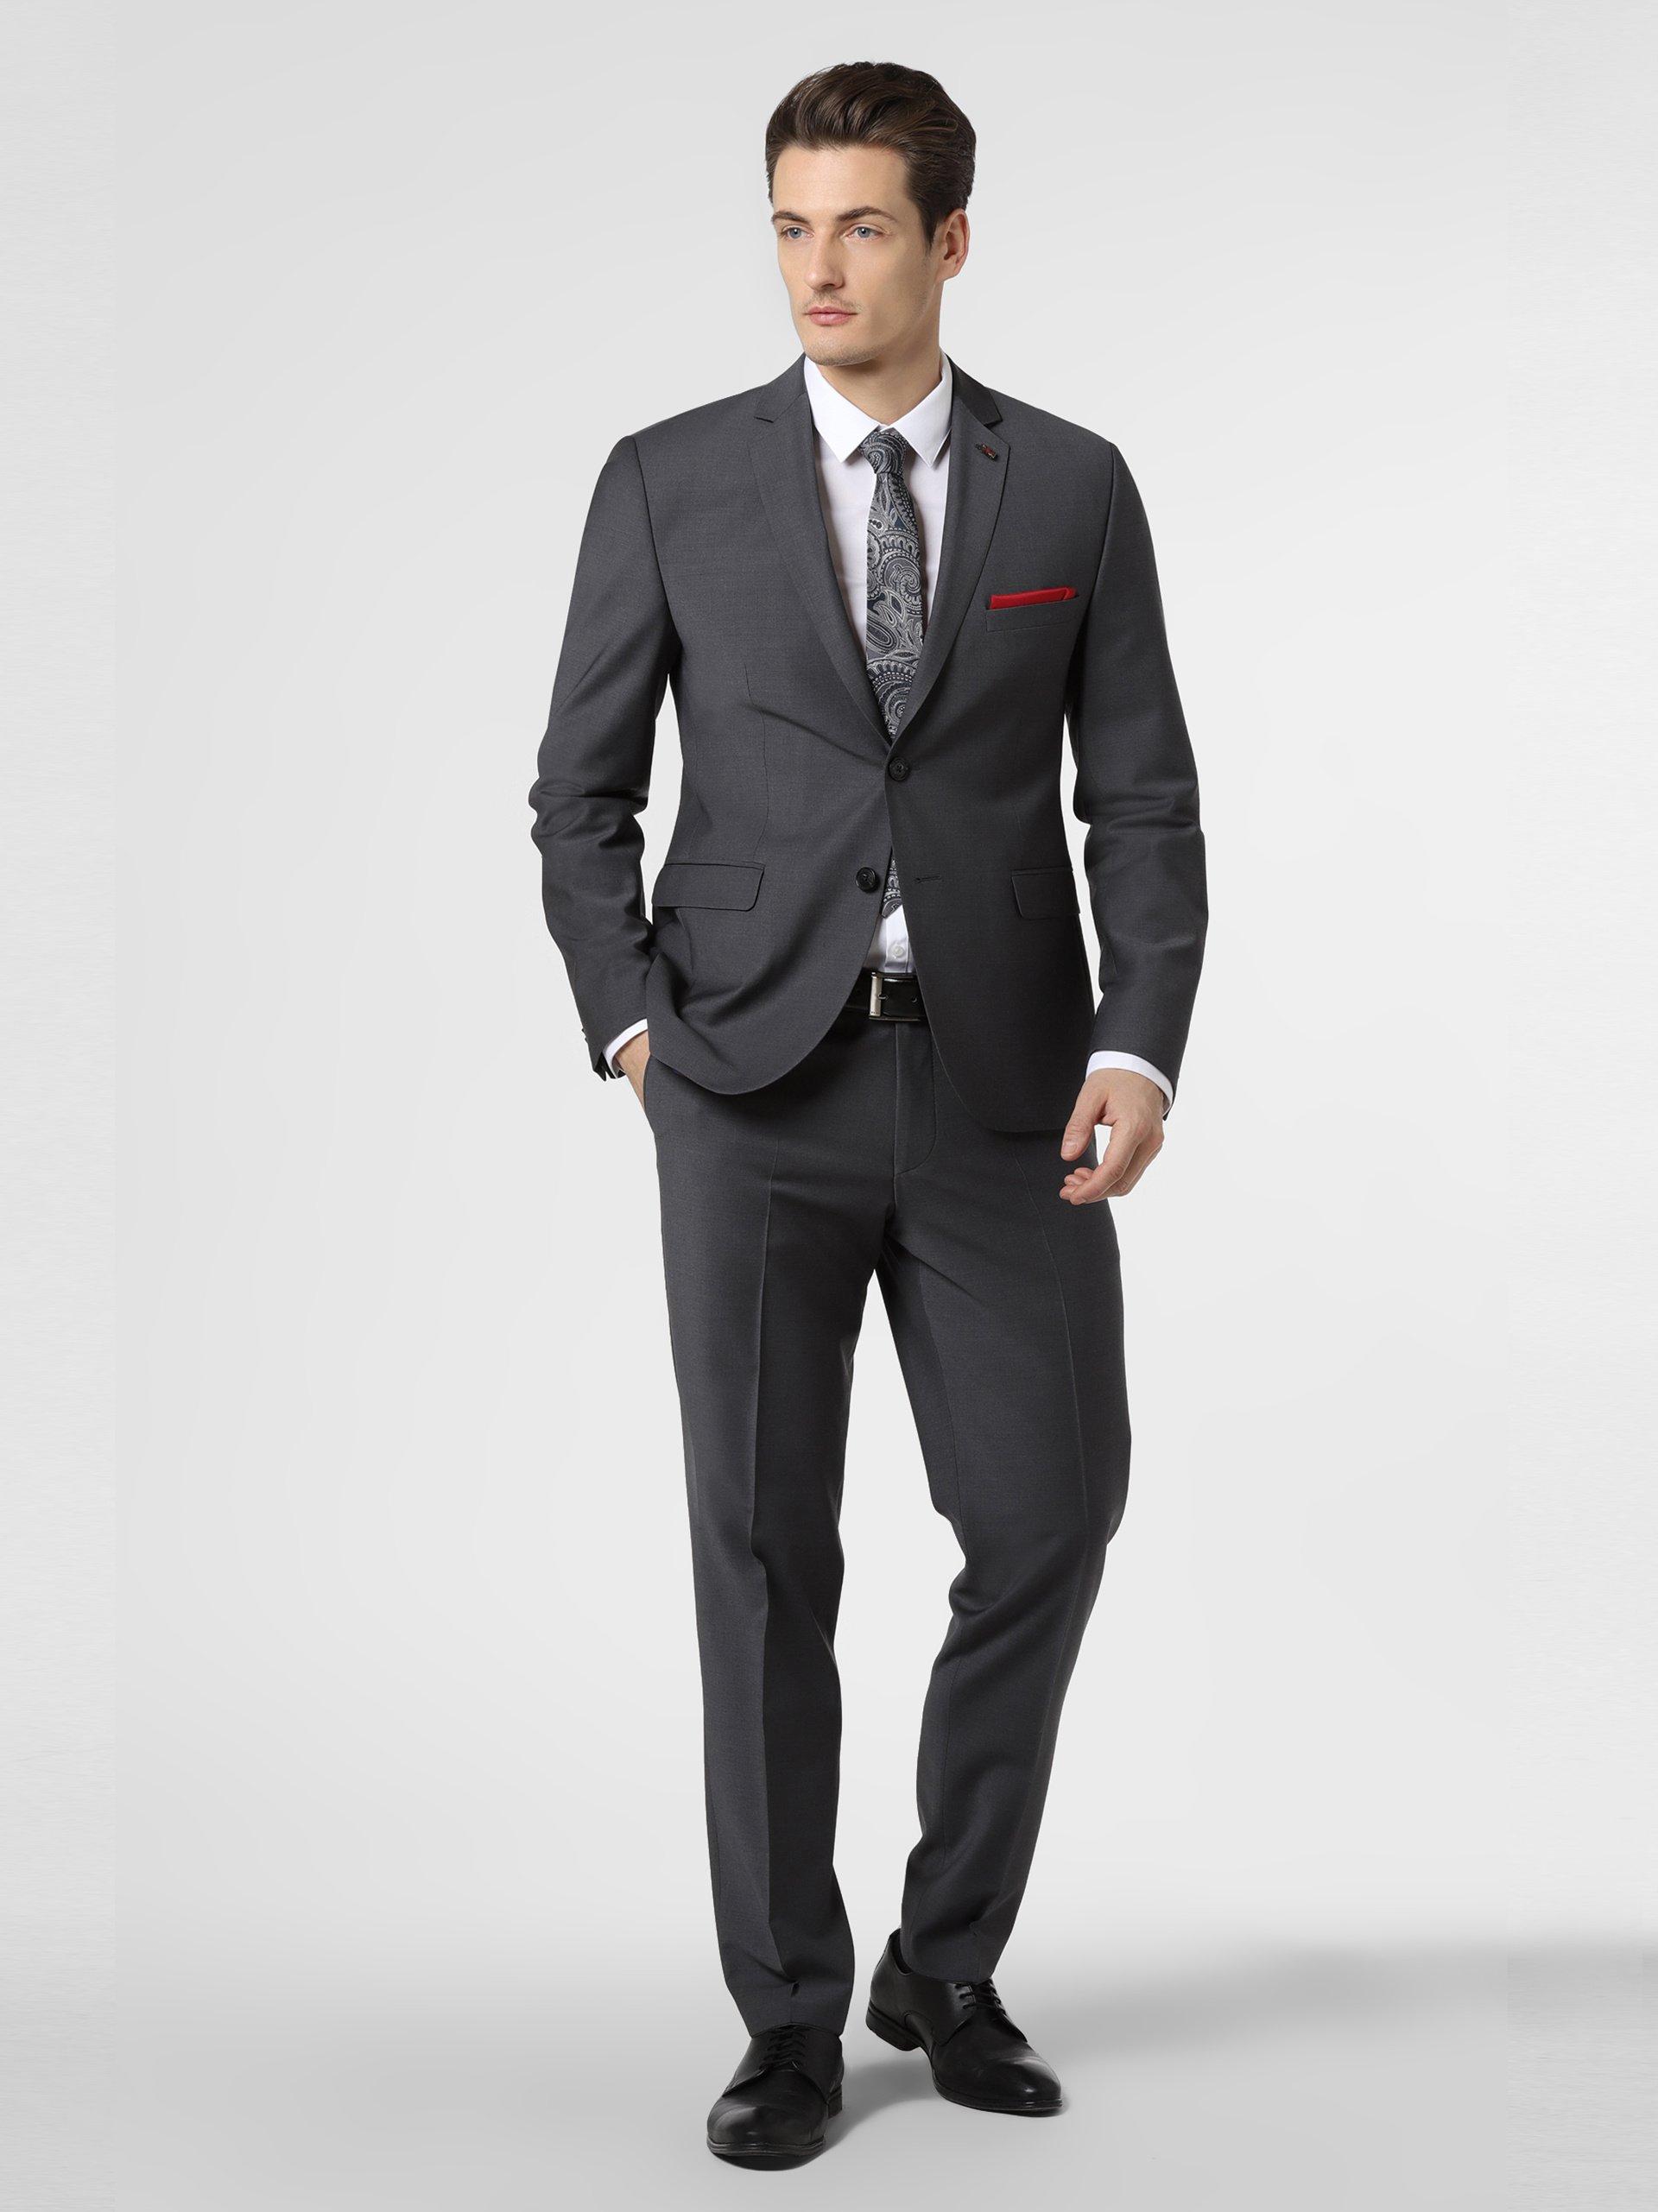 Finshley & Harding London Męskie spodnie od garnituru modułowego – Grant Athletic